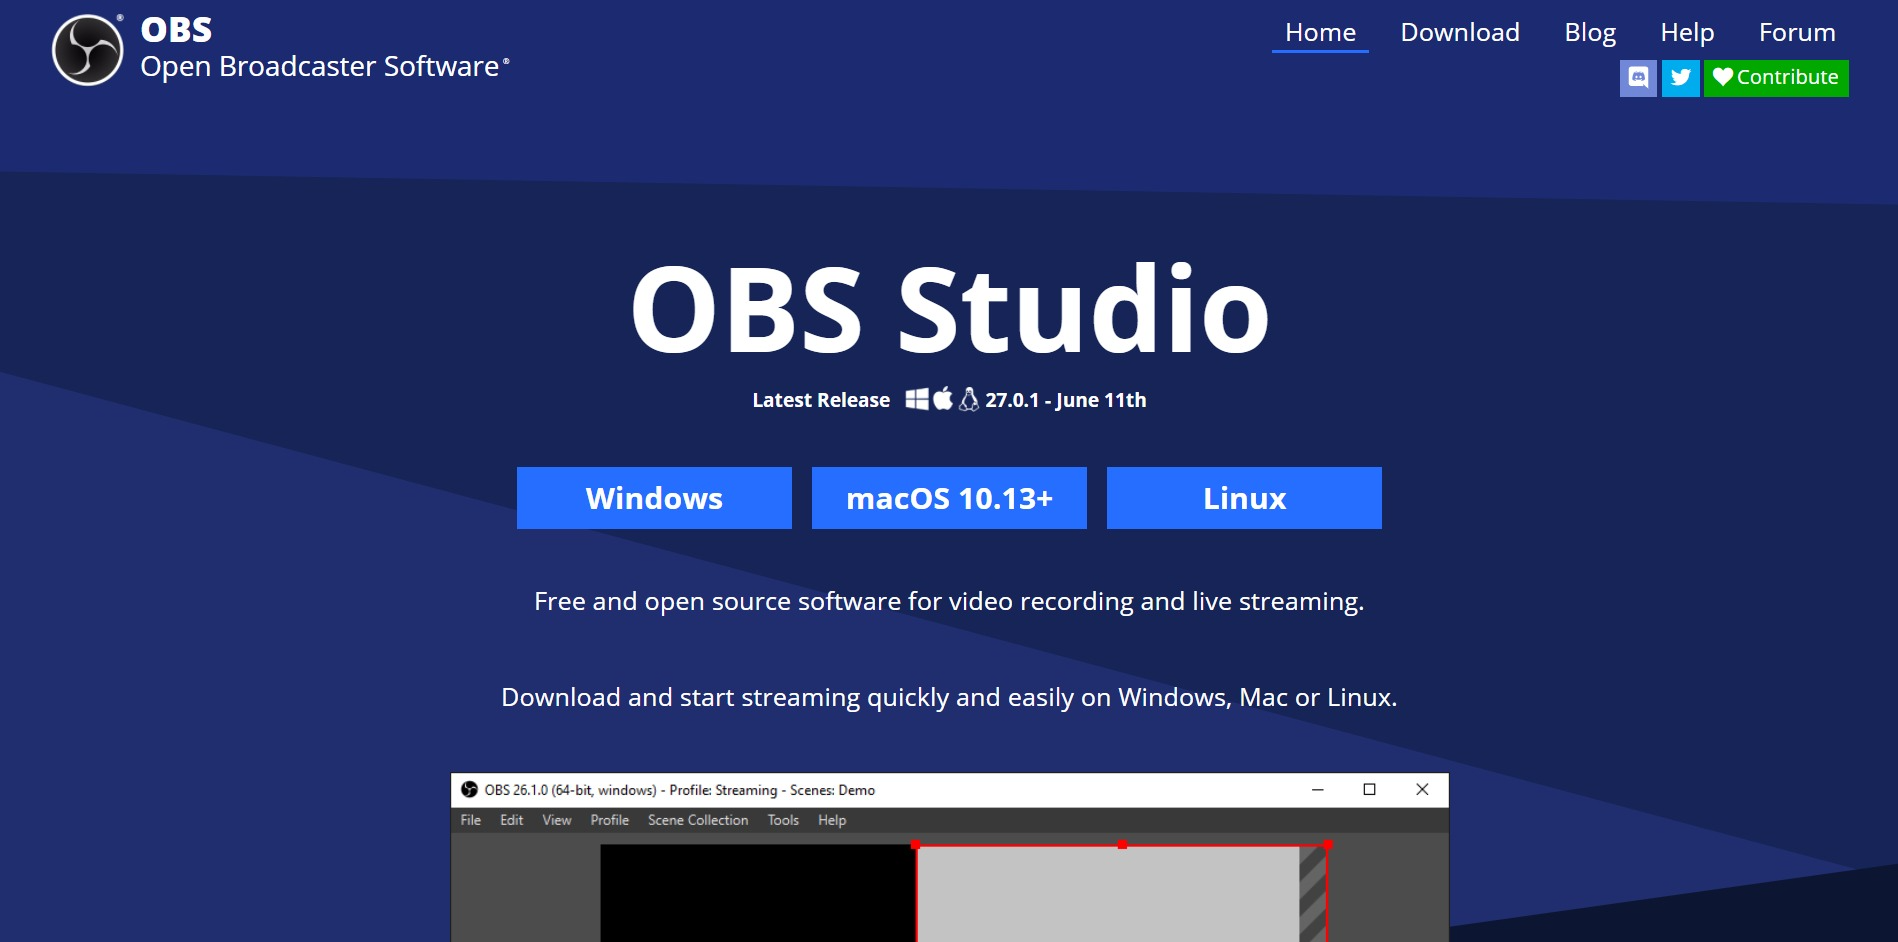 OBS Studio main page